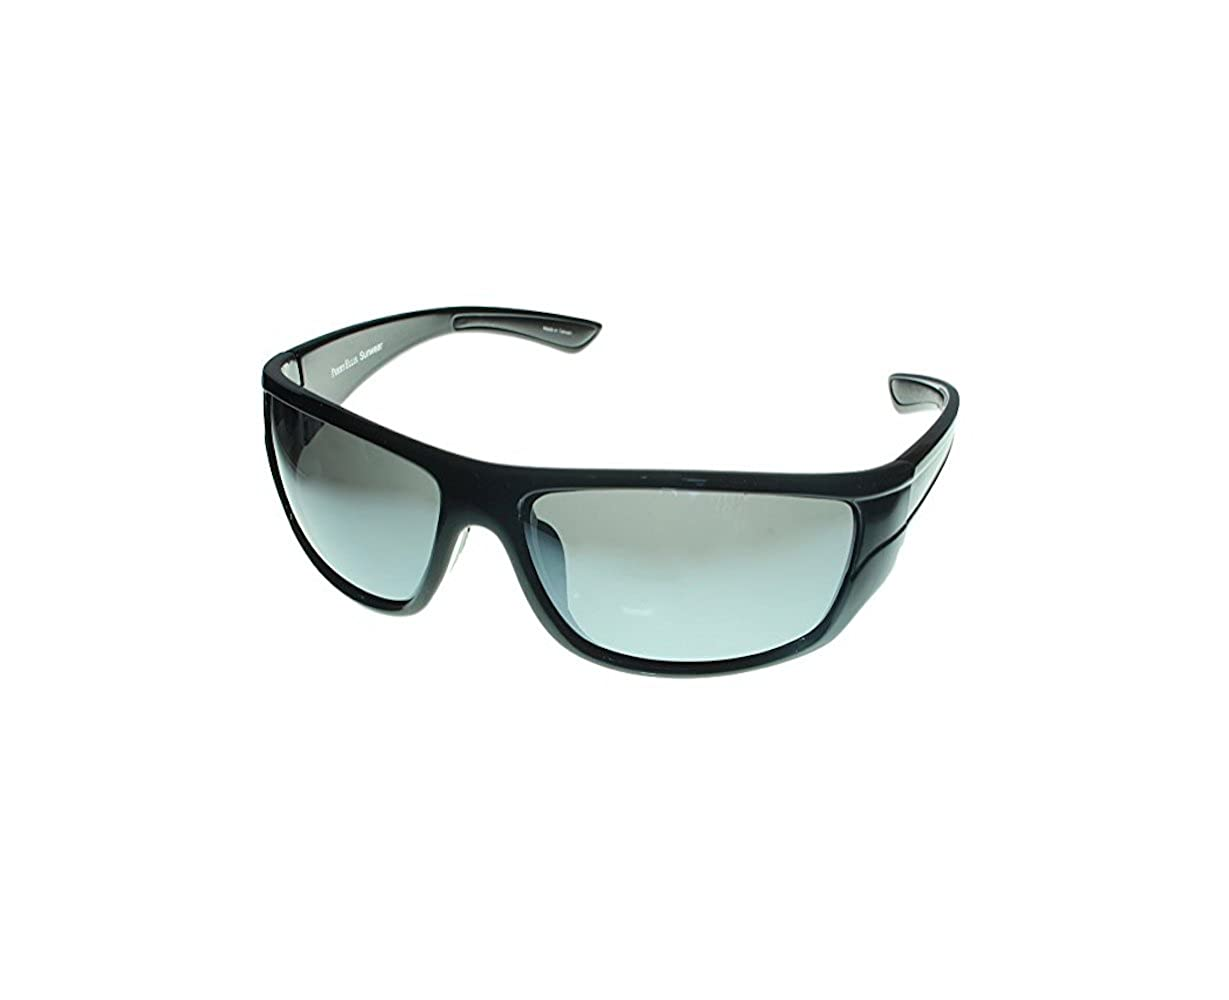 97ea6ba63cd Amazon.com  Perry Ellis Sunglasses Mens Black Crystal Plastic Wrap PE18 1   Clothing